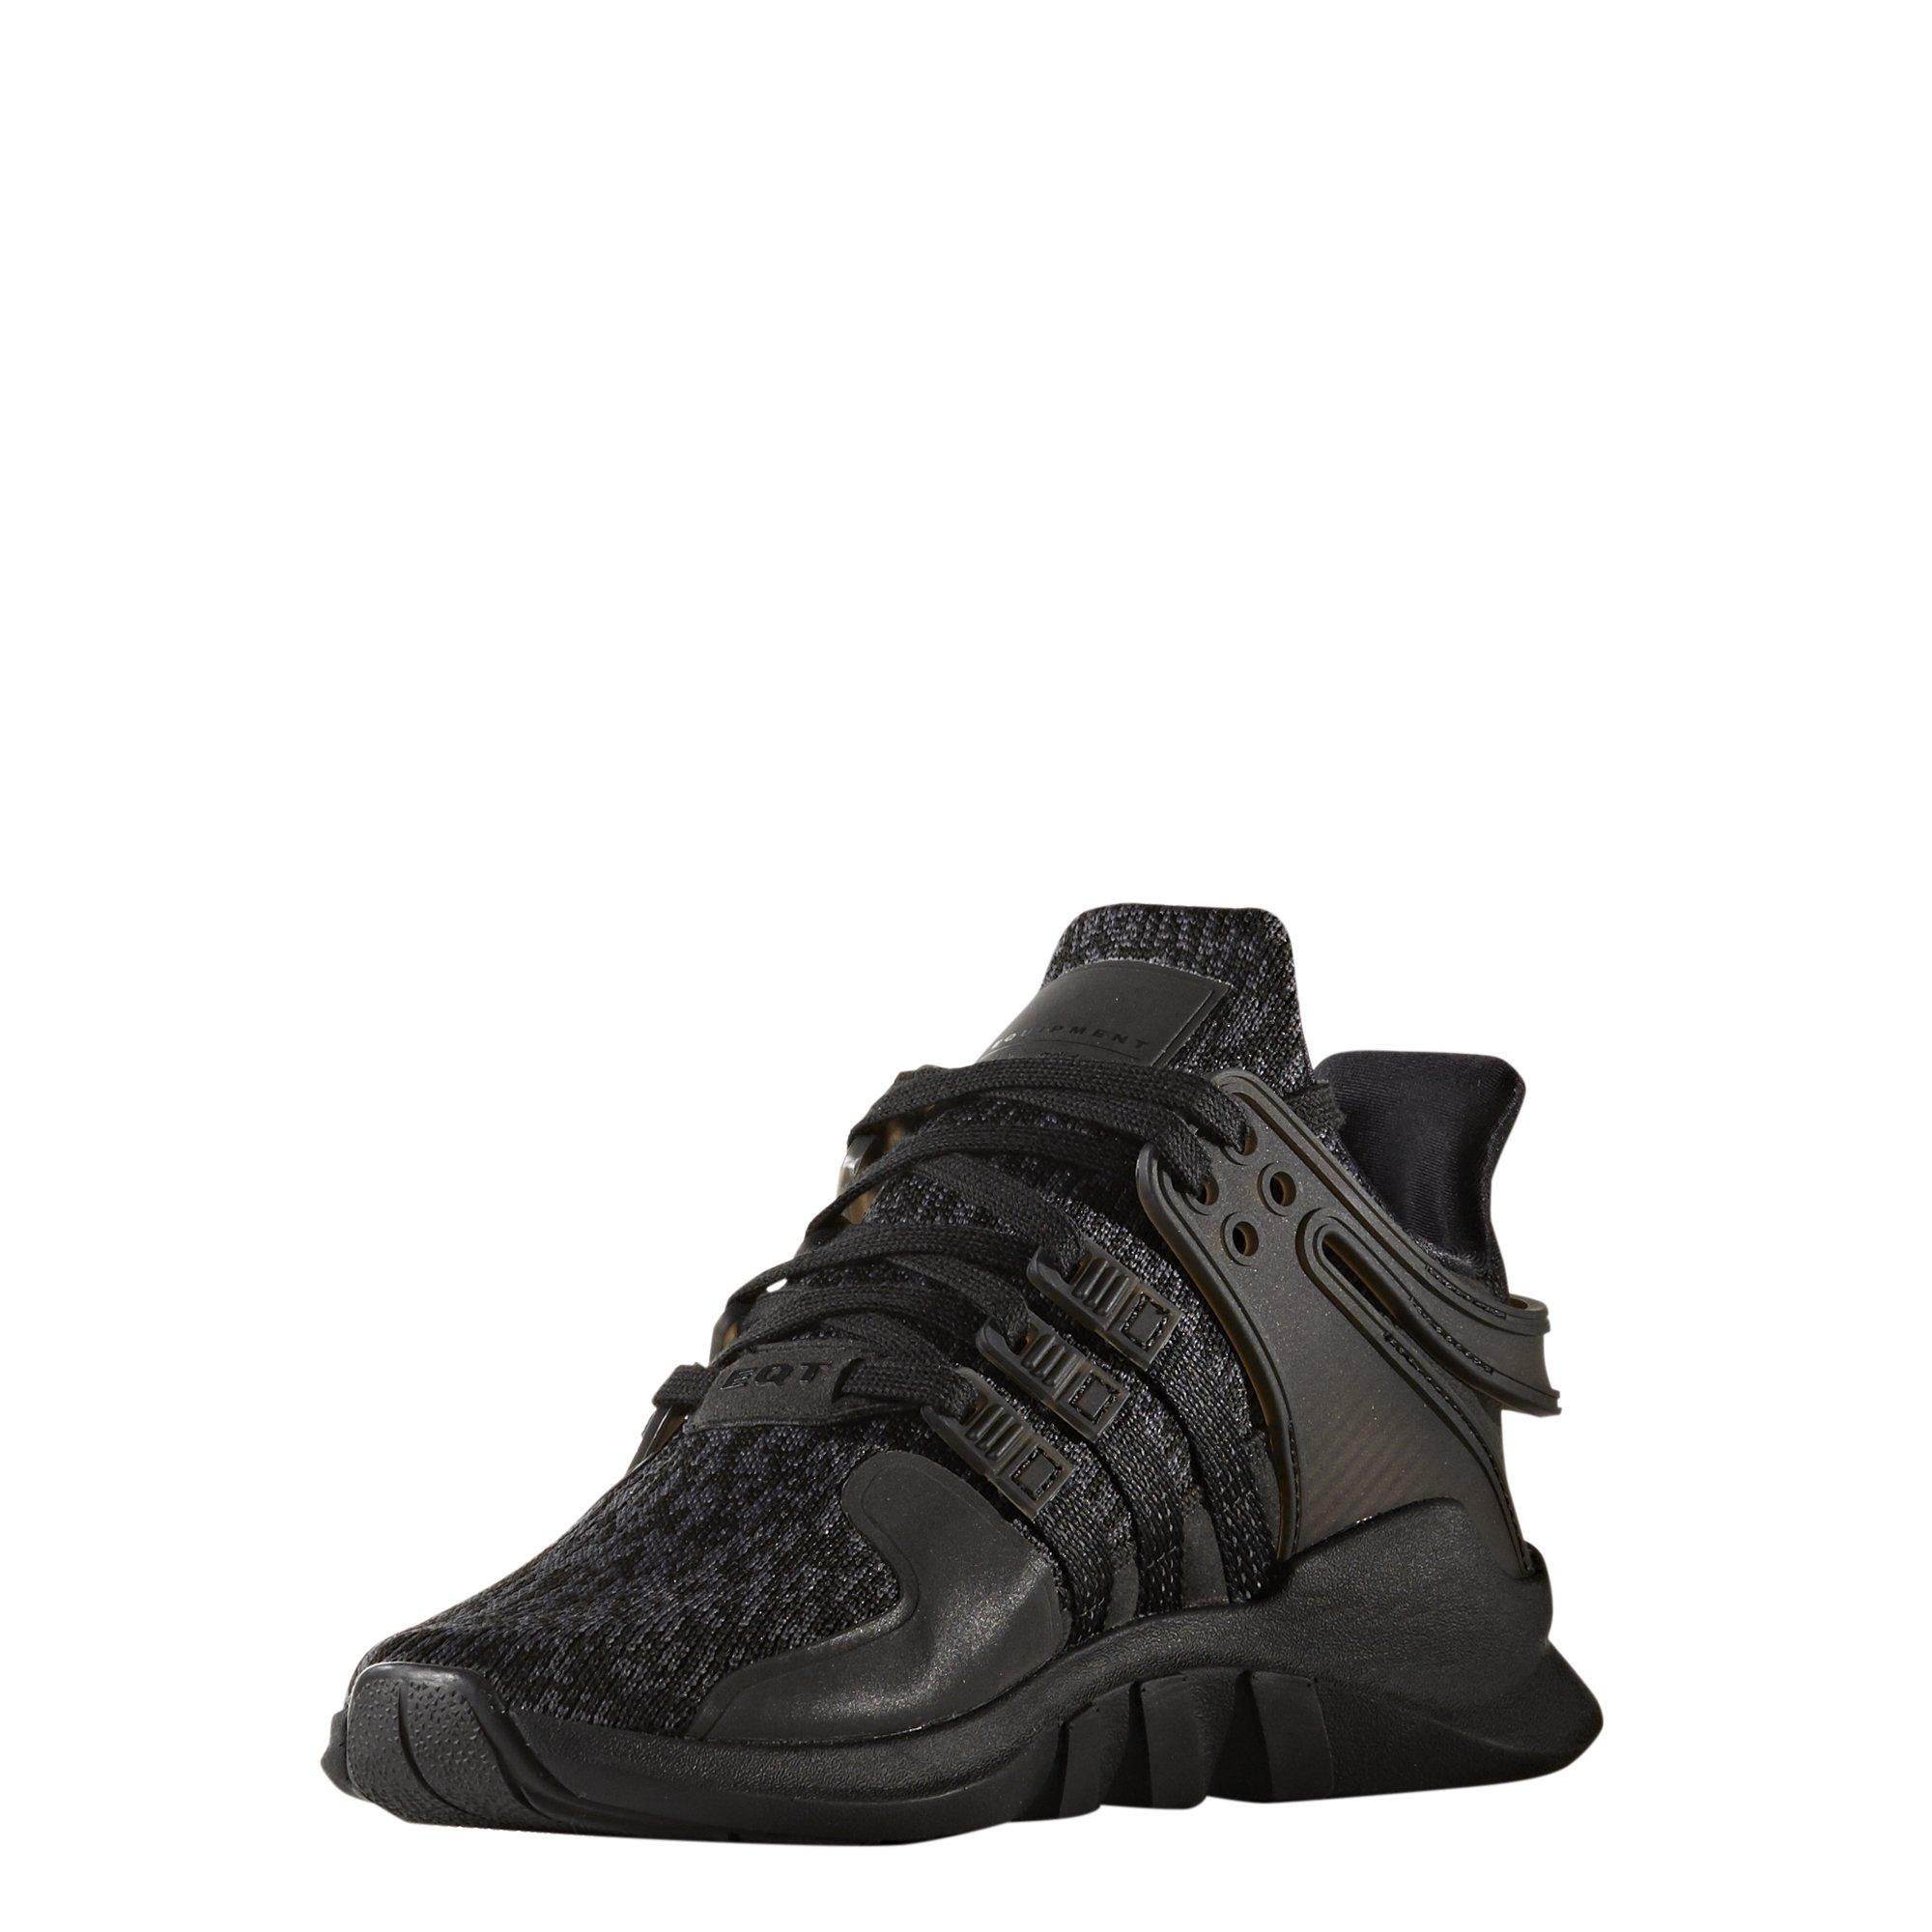 adidas Originals Boys' EQT Support ADV J Running Shoe, Black, 6.5 M US Big Kid by adidas Originals (Image #7)